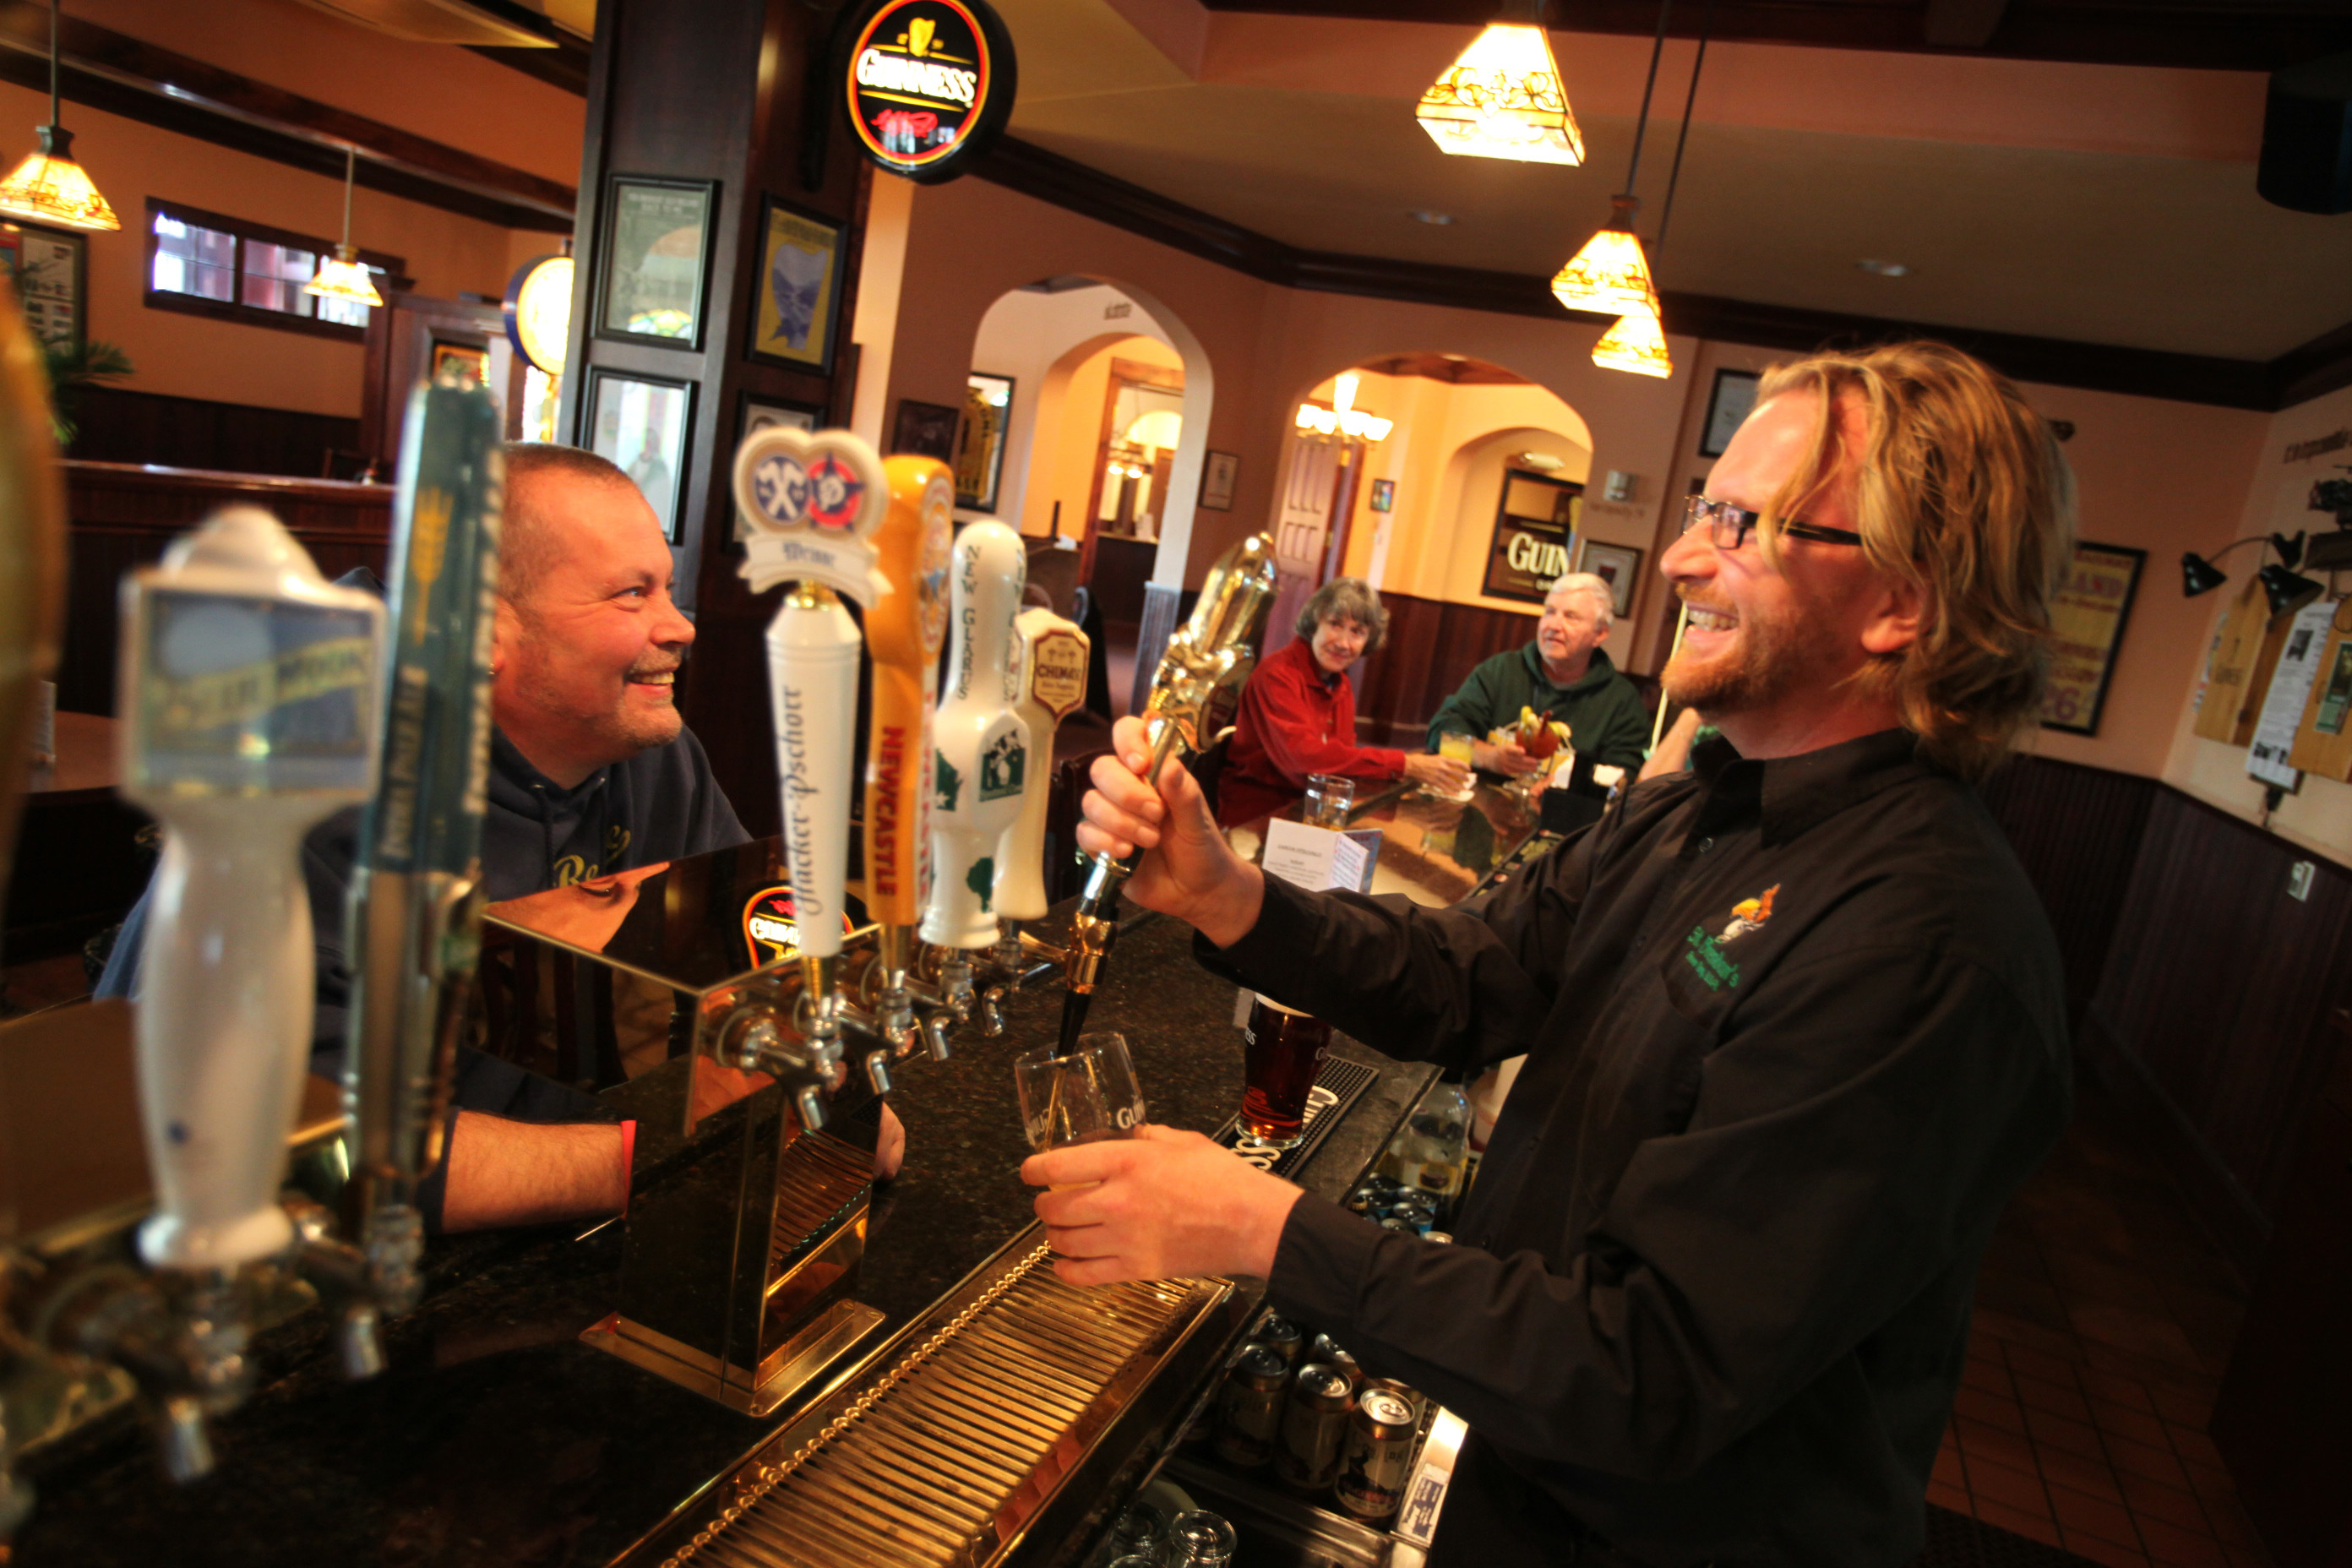 St. Brendan's Inn bar. Green Bay, Wisconsin.